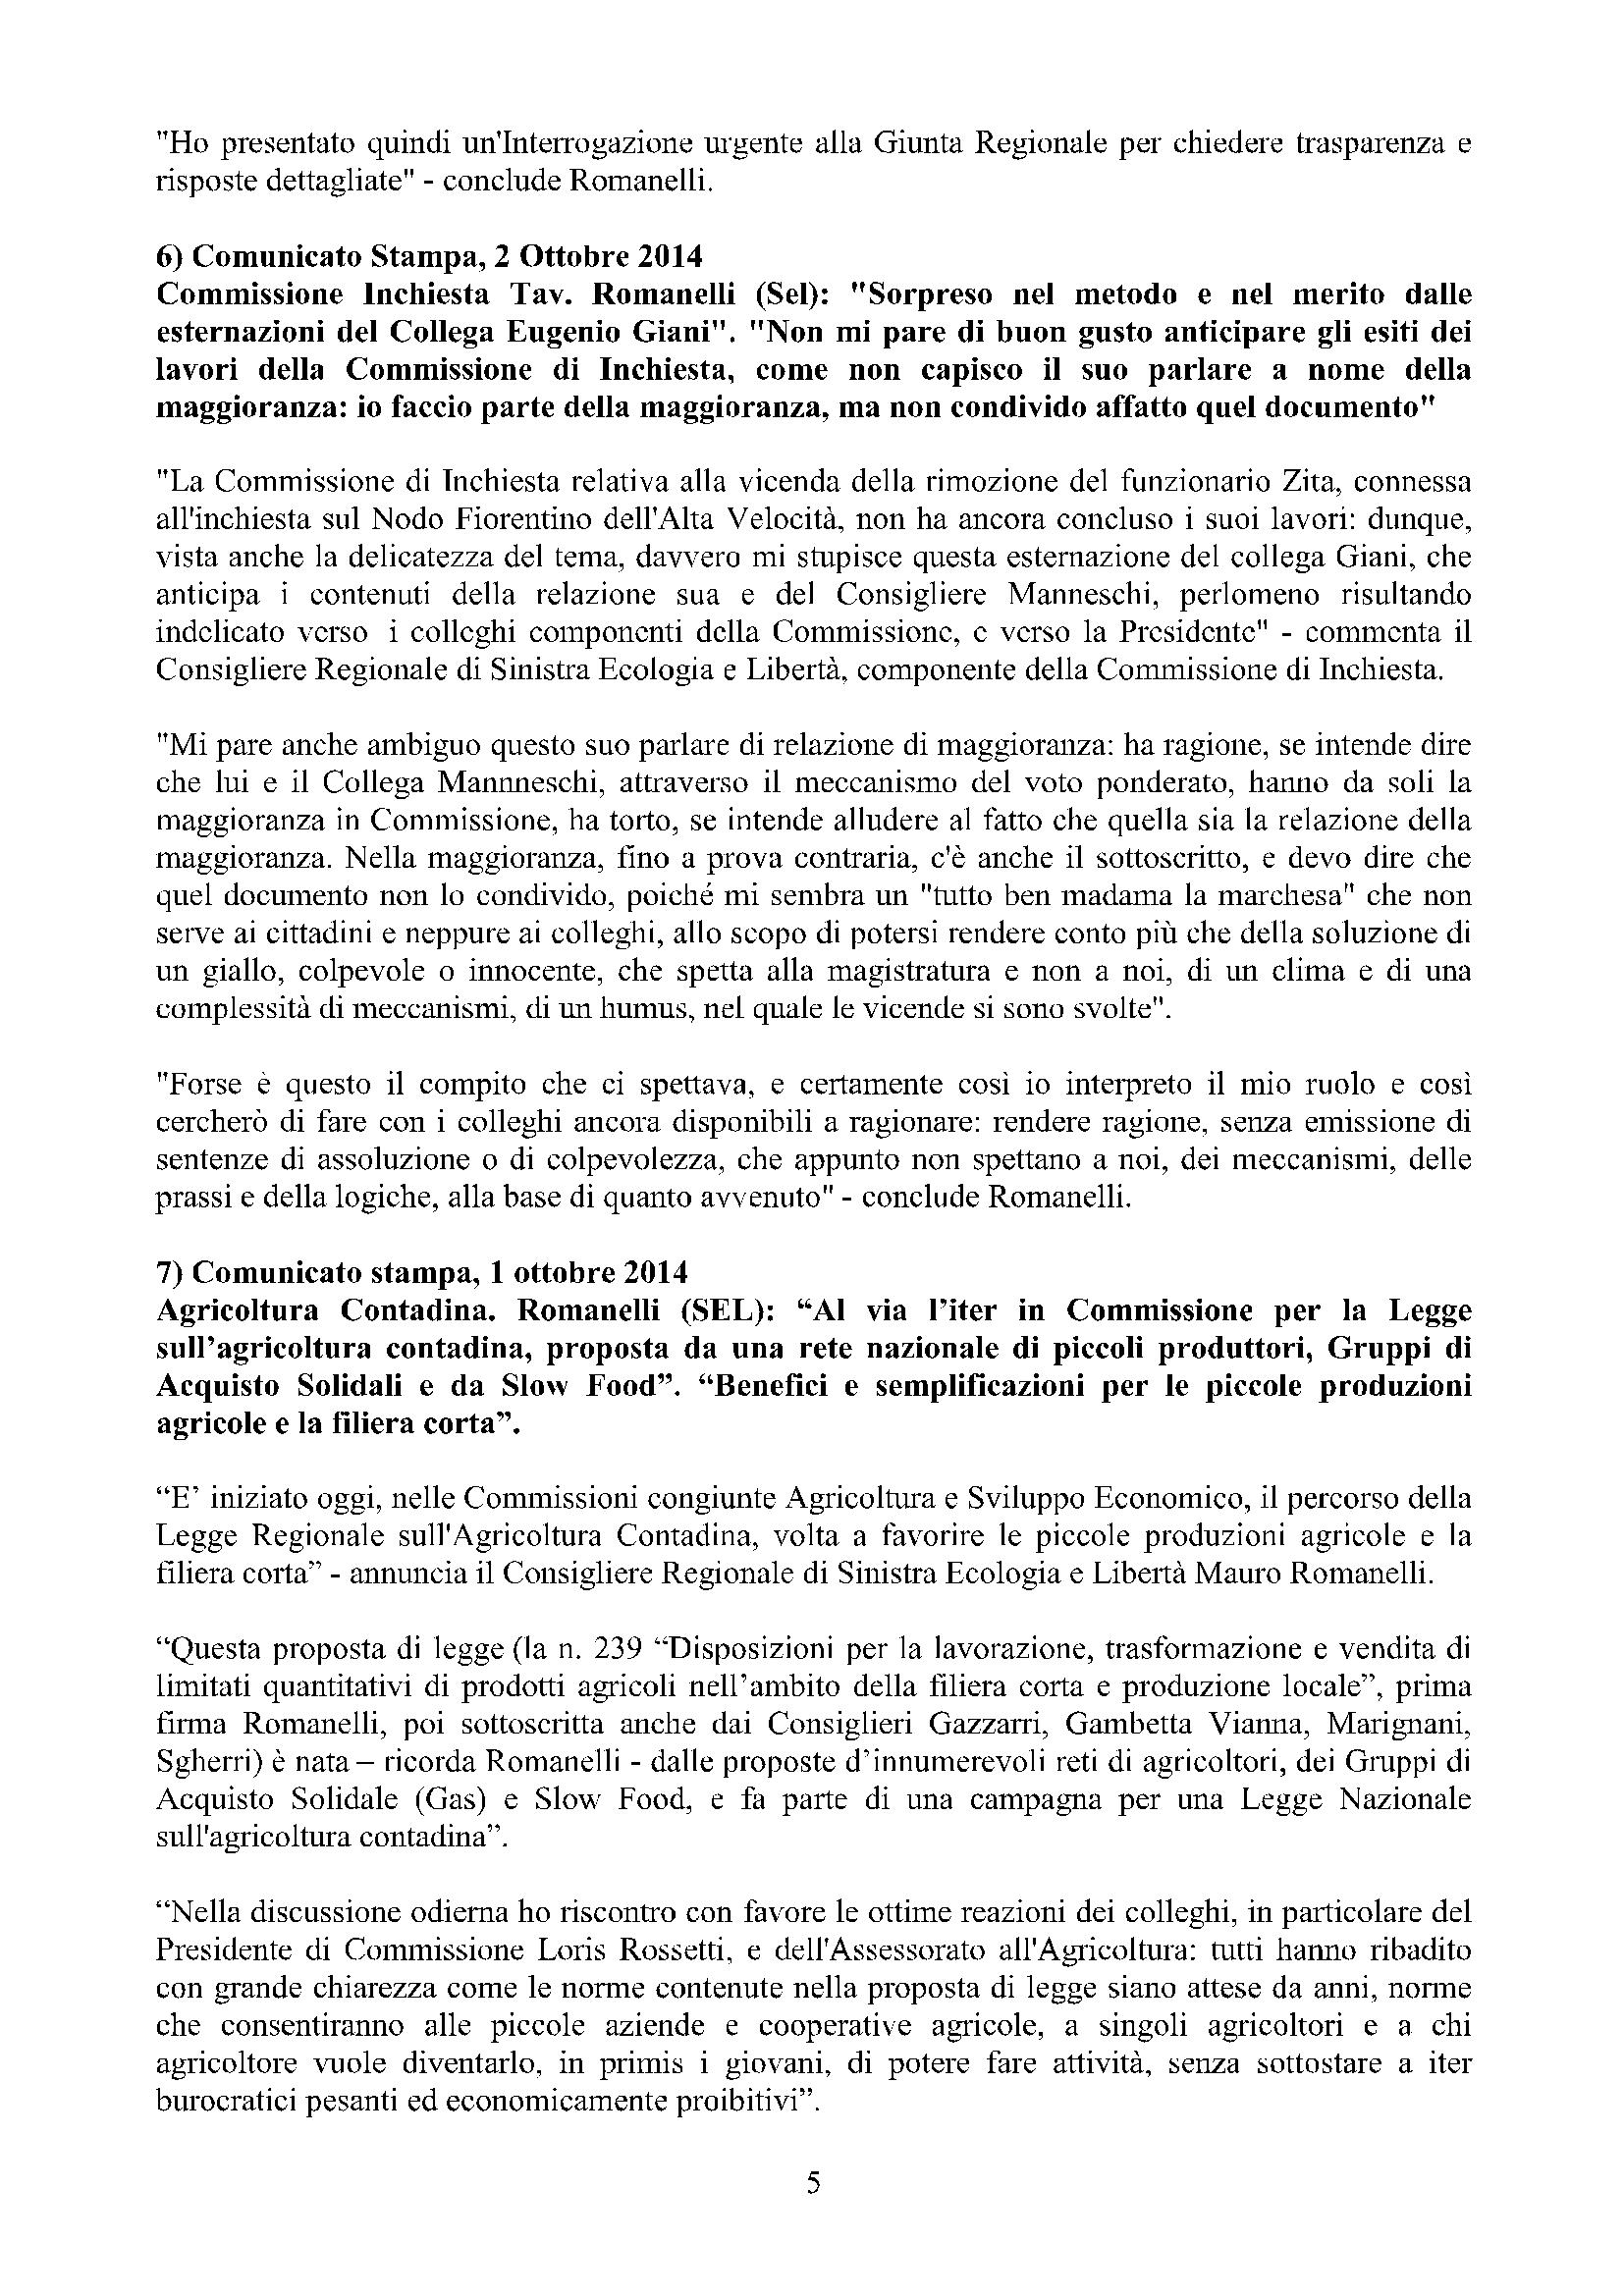 Newsletter di MAURO ROMANELLI Ottobre 2014 -5